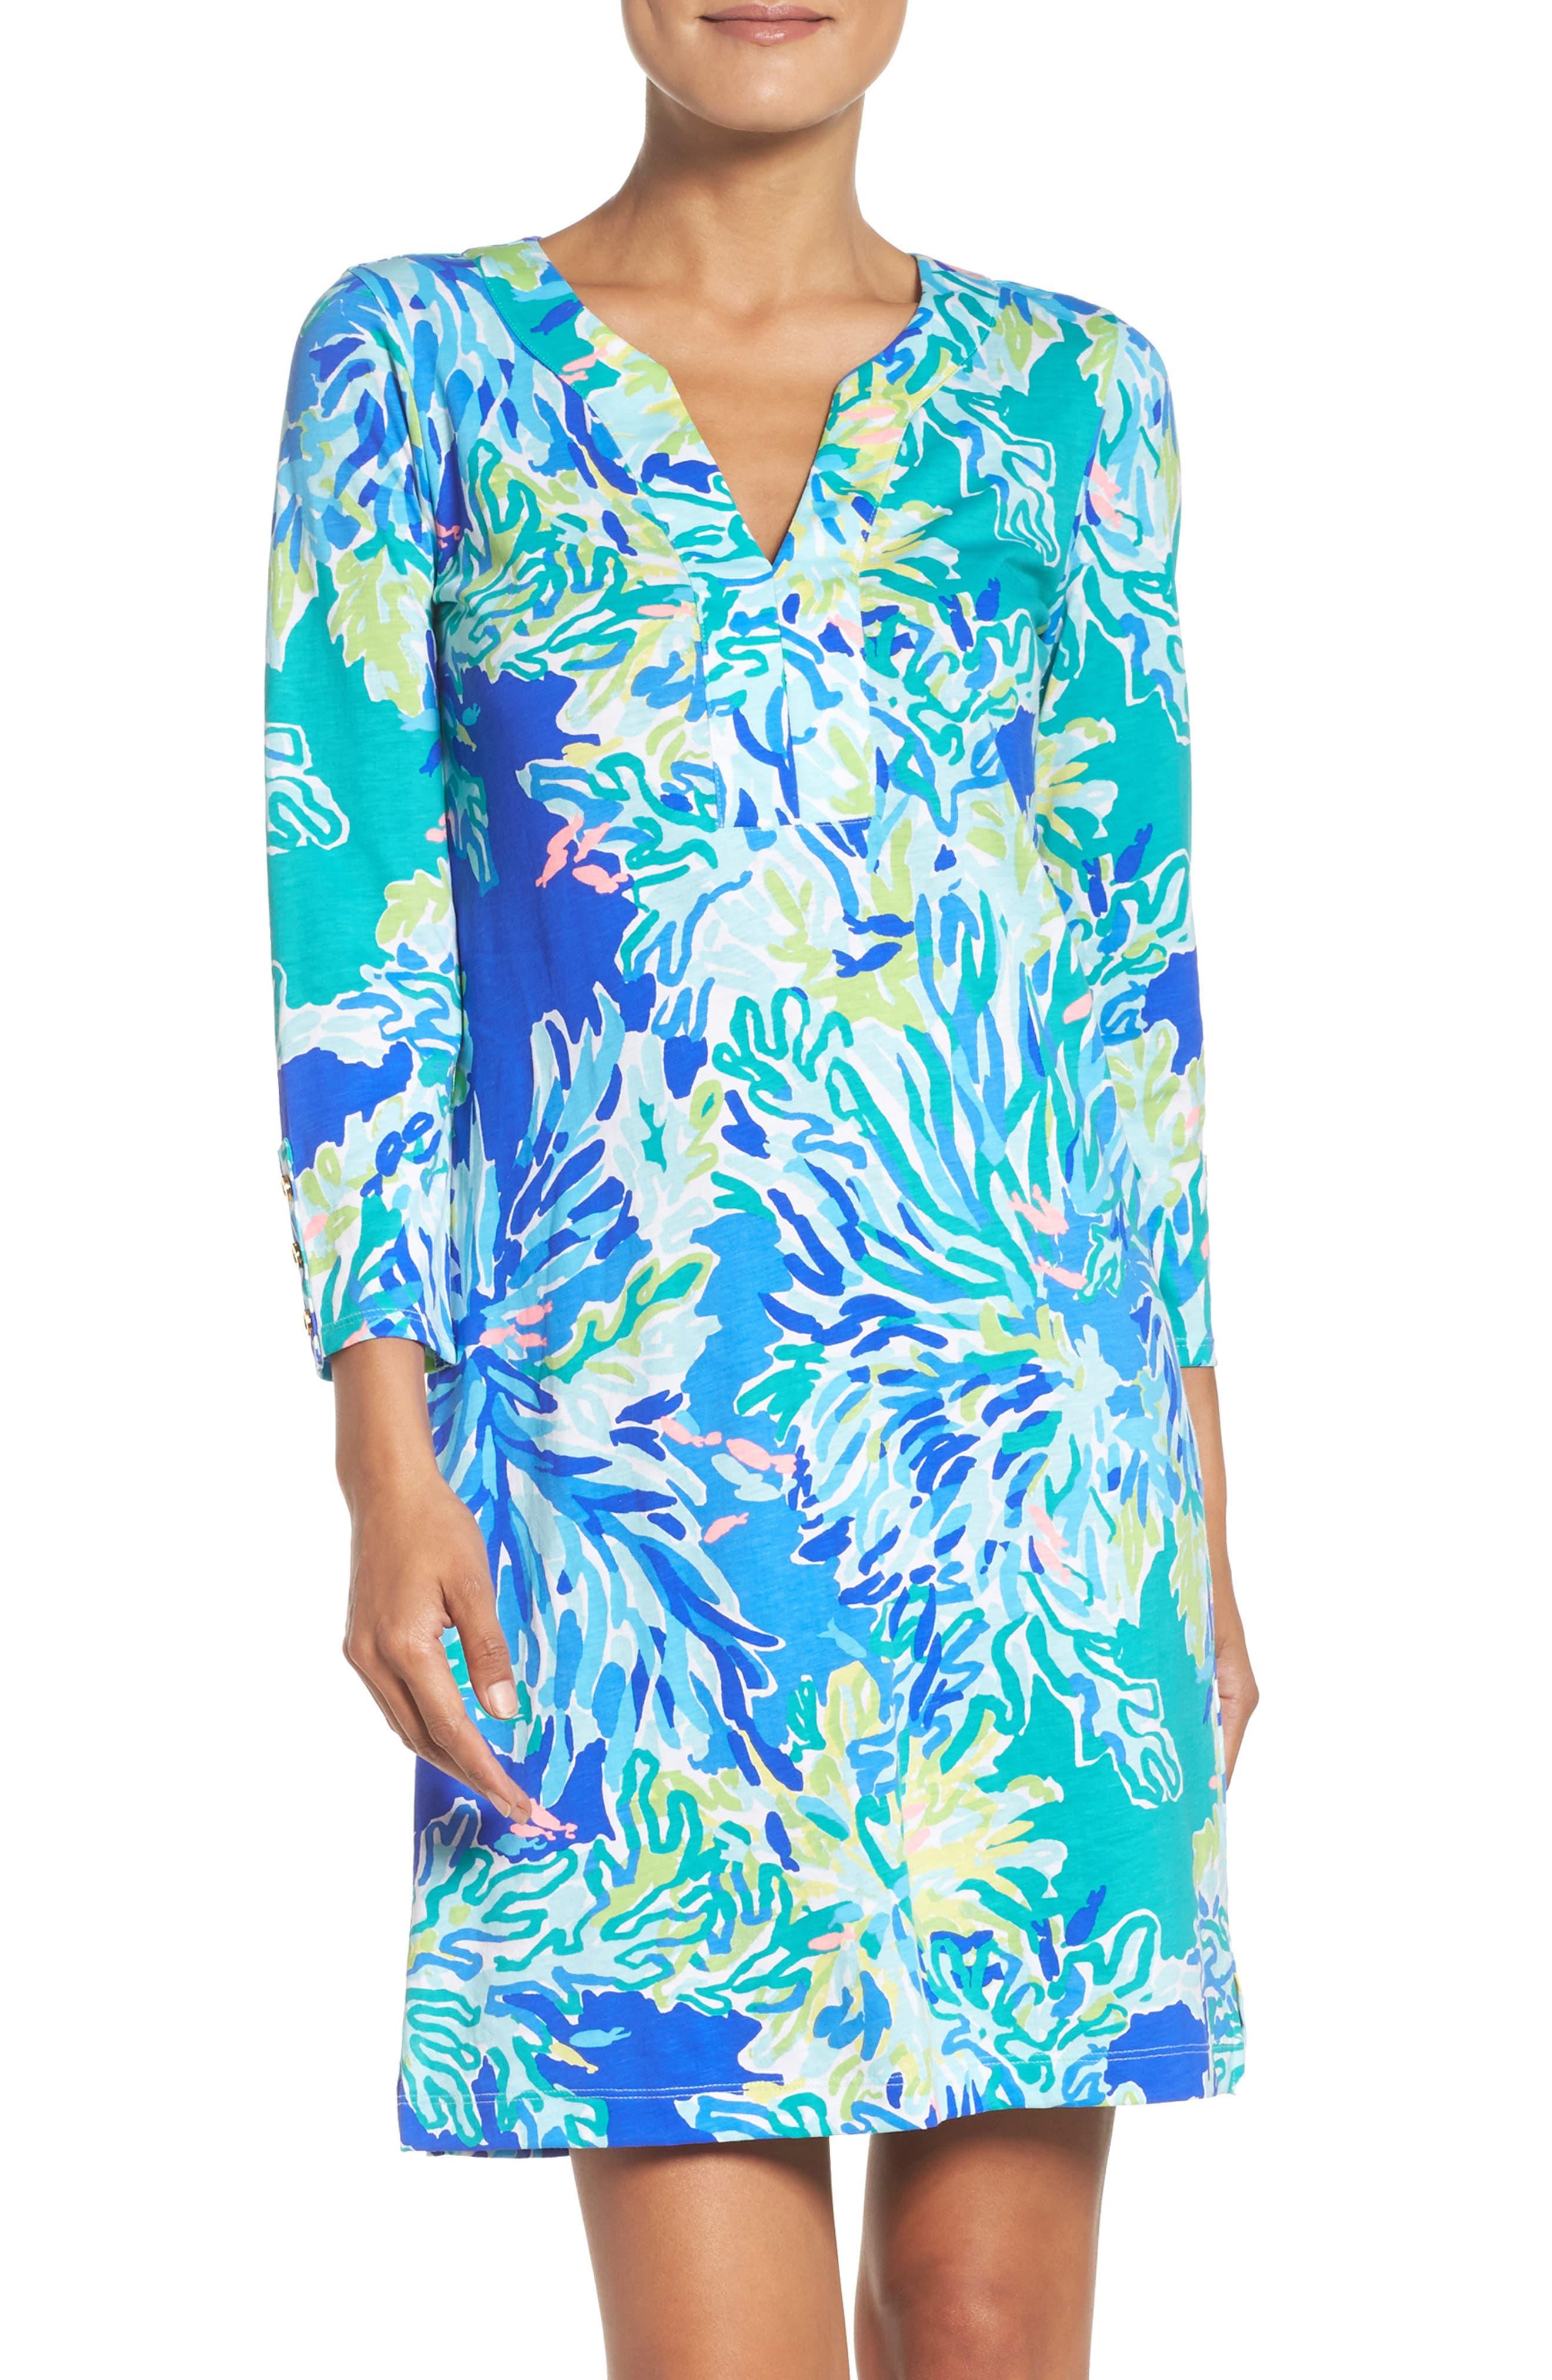 Main Image - Lilly Pulitzer® Riva Dress